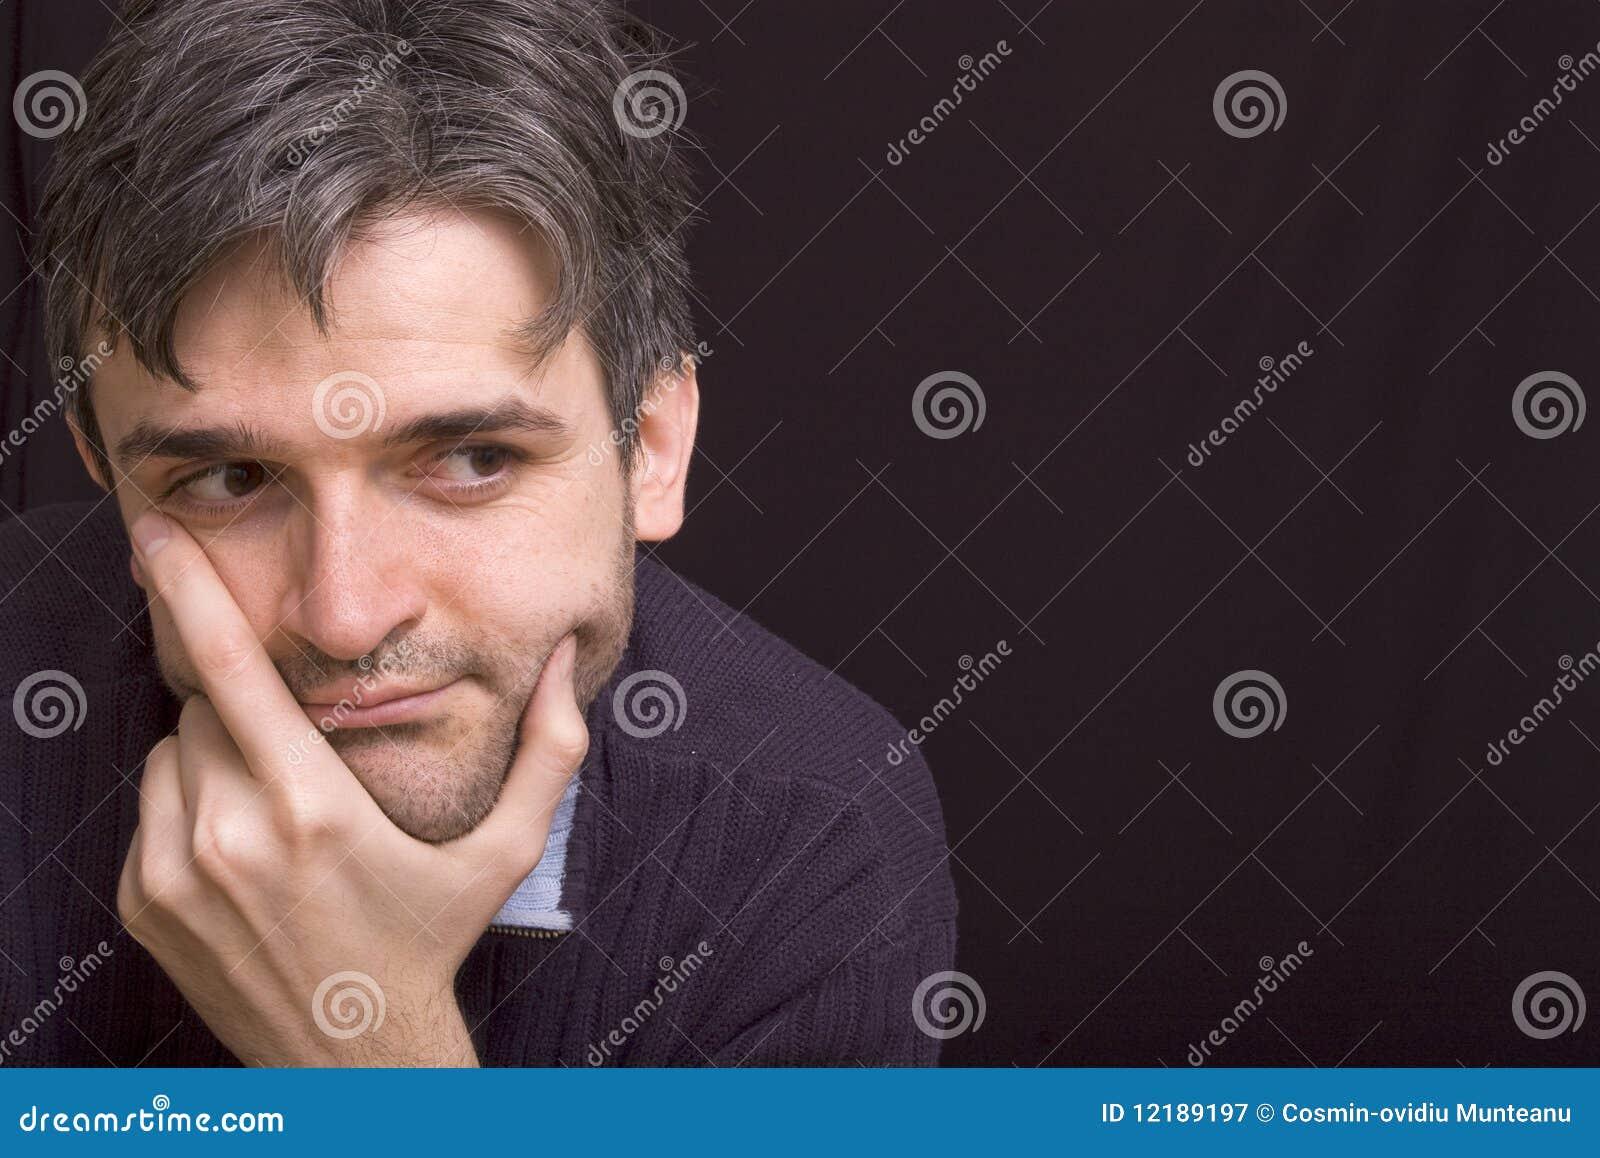 Thinking Man Short Beard Stock Images - Download 658 ...